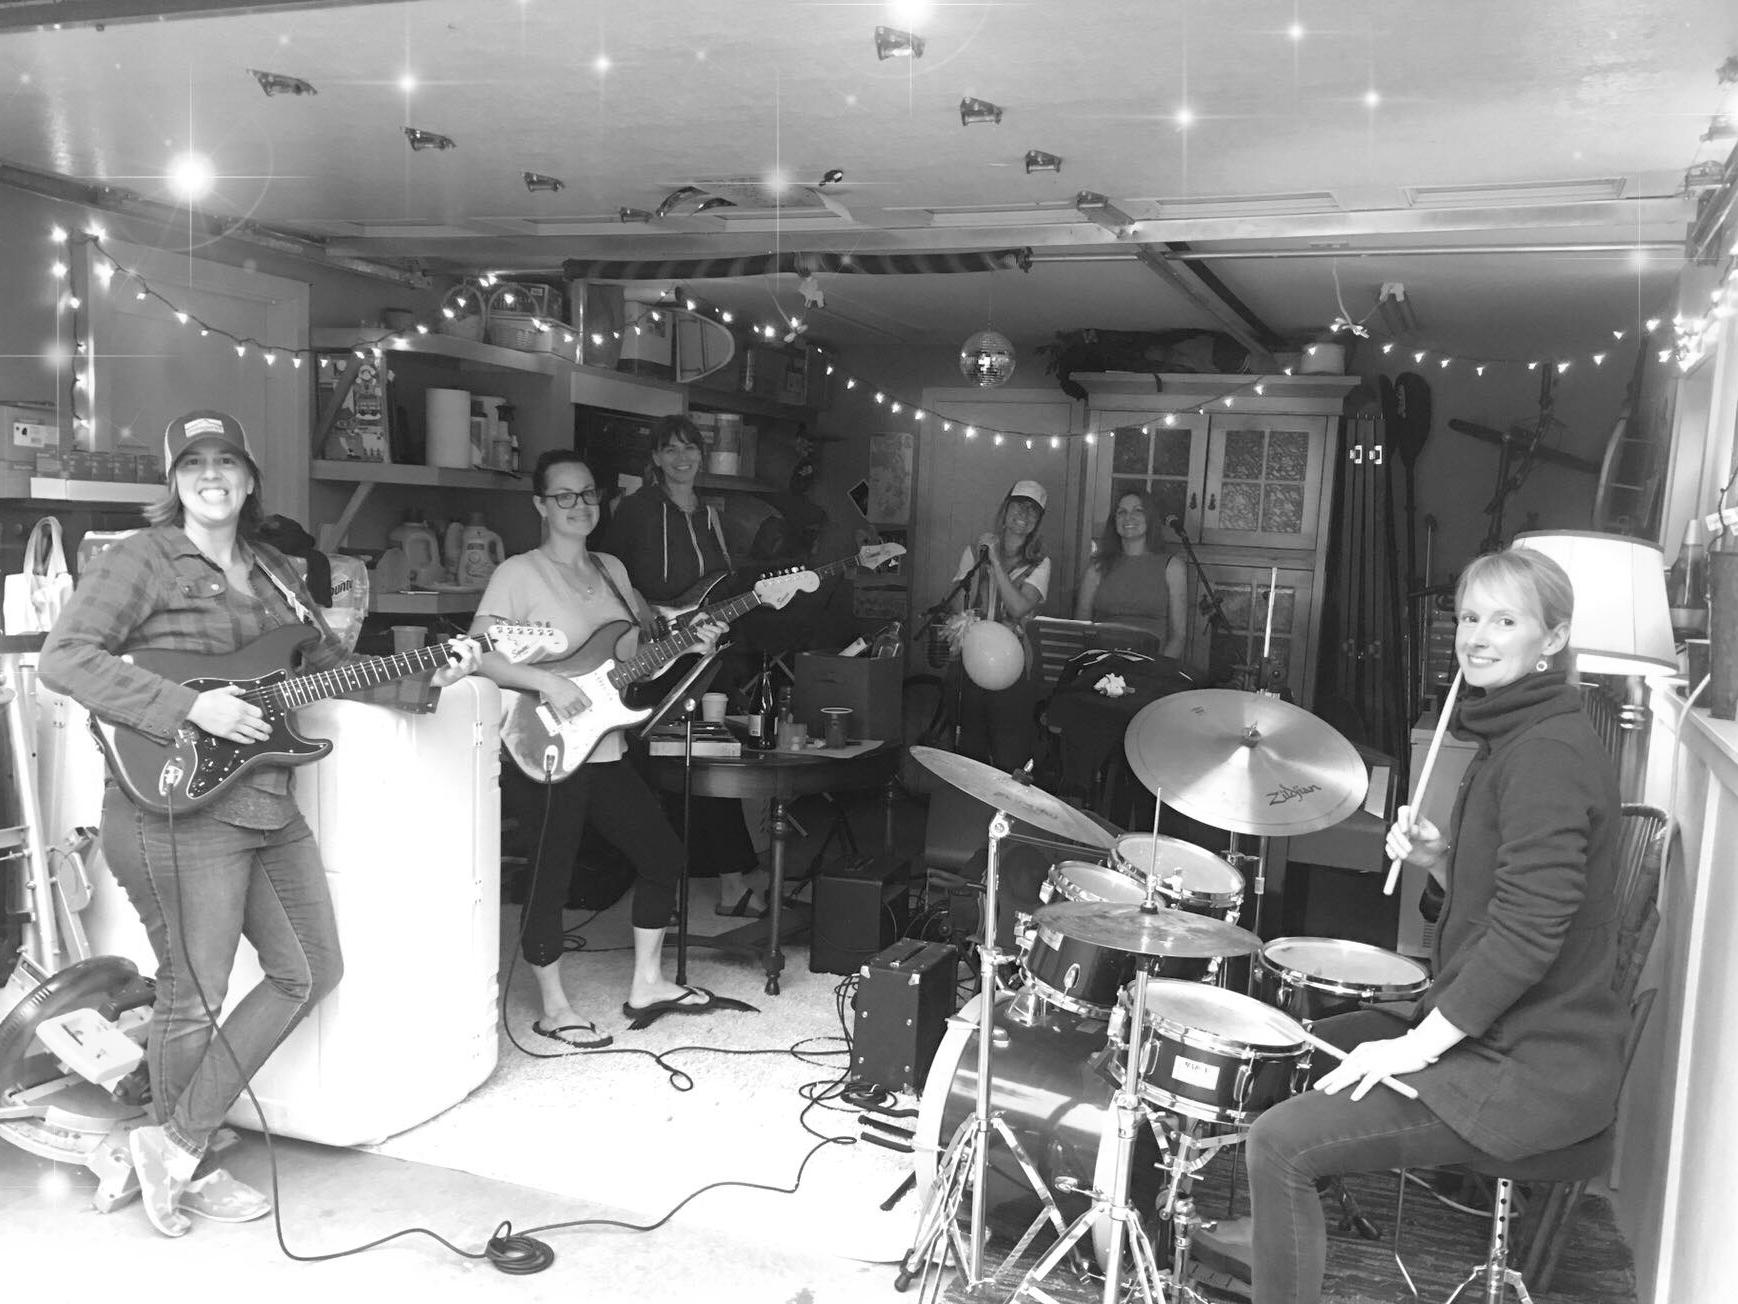 La Fawnduh the Garage Band